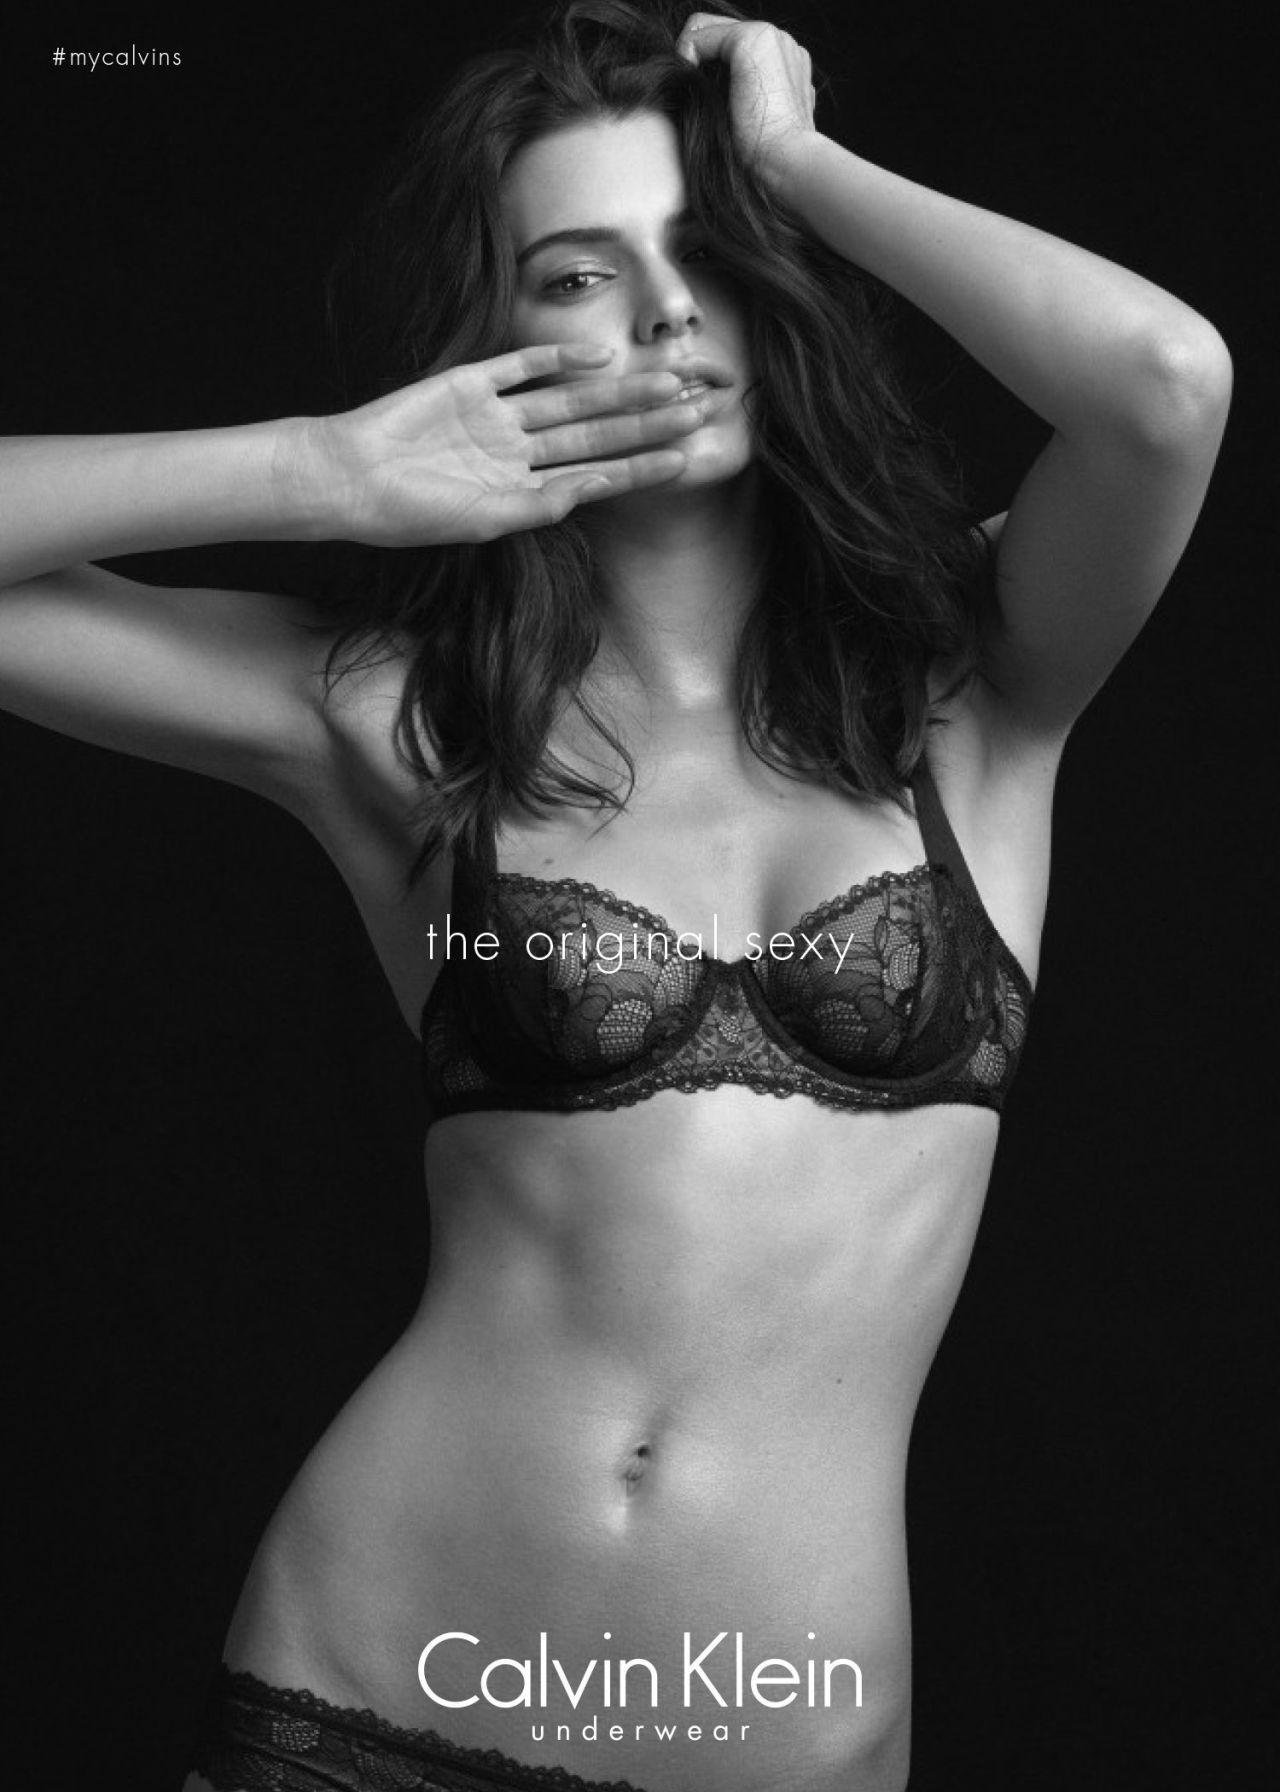 Kendall Jenner Sexy (6 Photos)